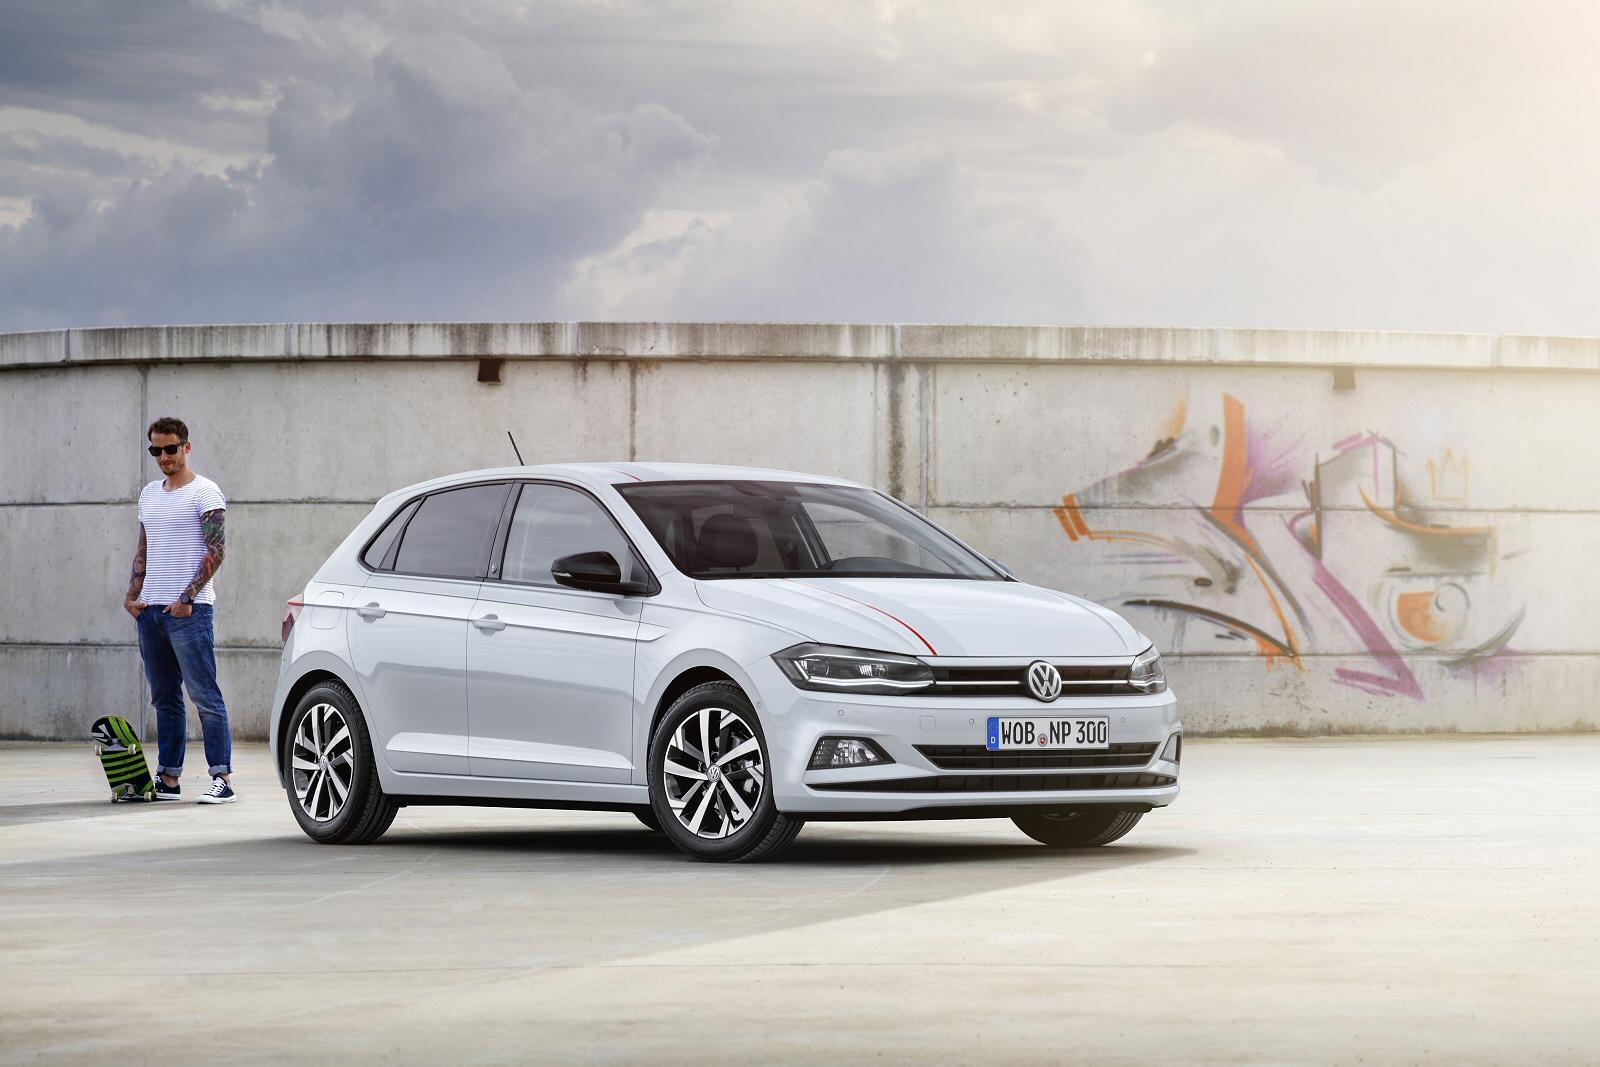 Volkswagen Polo 2.0 TSI 207 GTI 5dr DSG